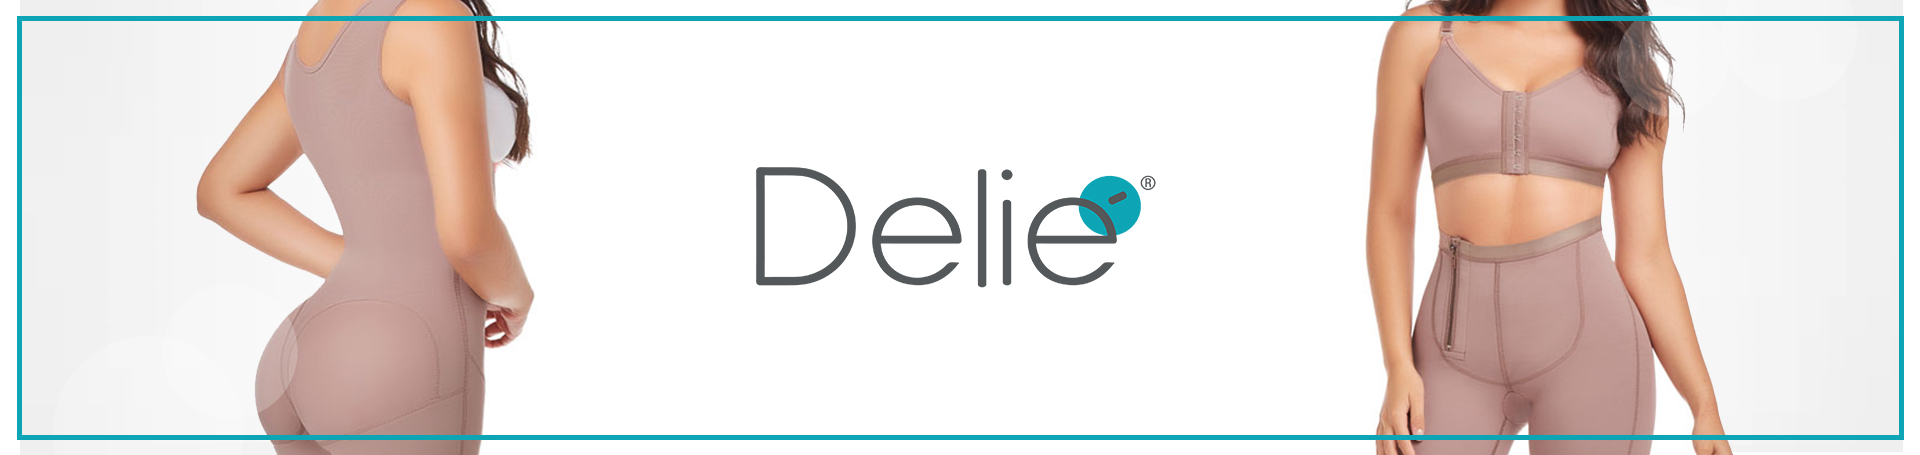 Delie